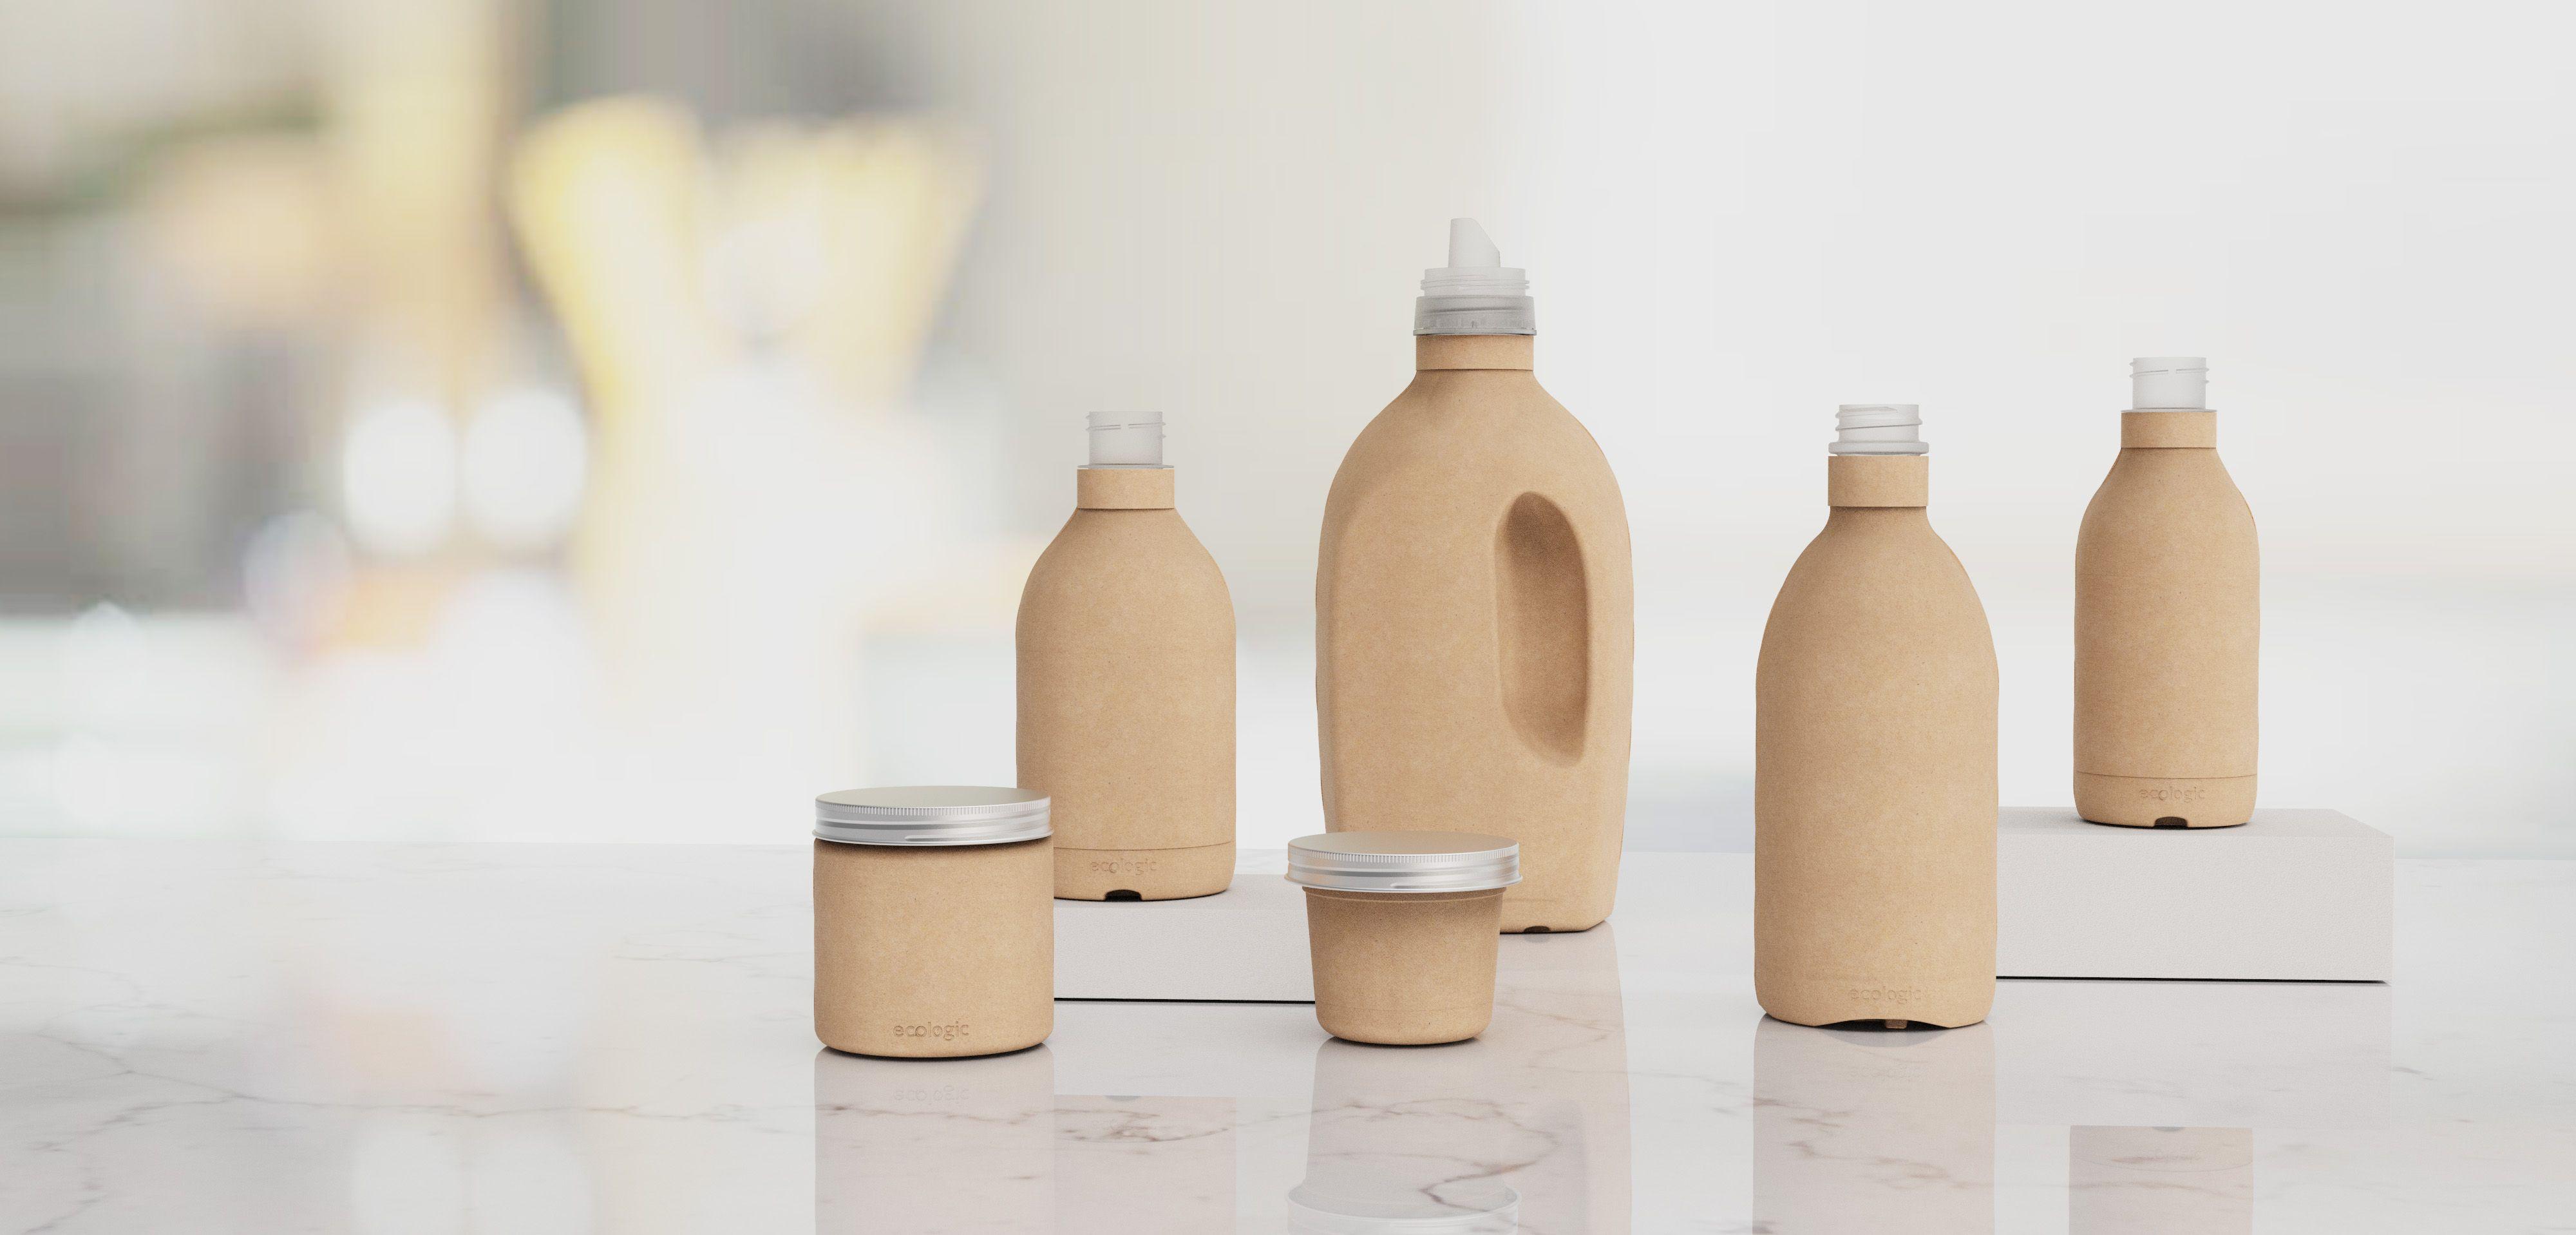 Fotografia botellas eco.bottle de Ecologic